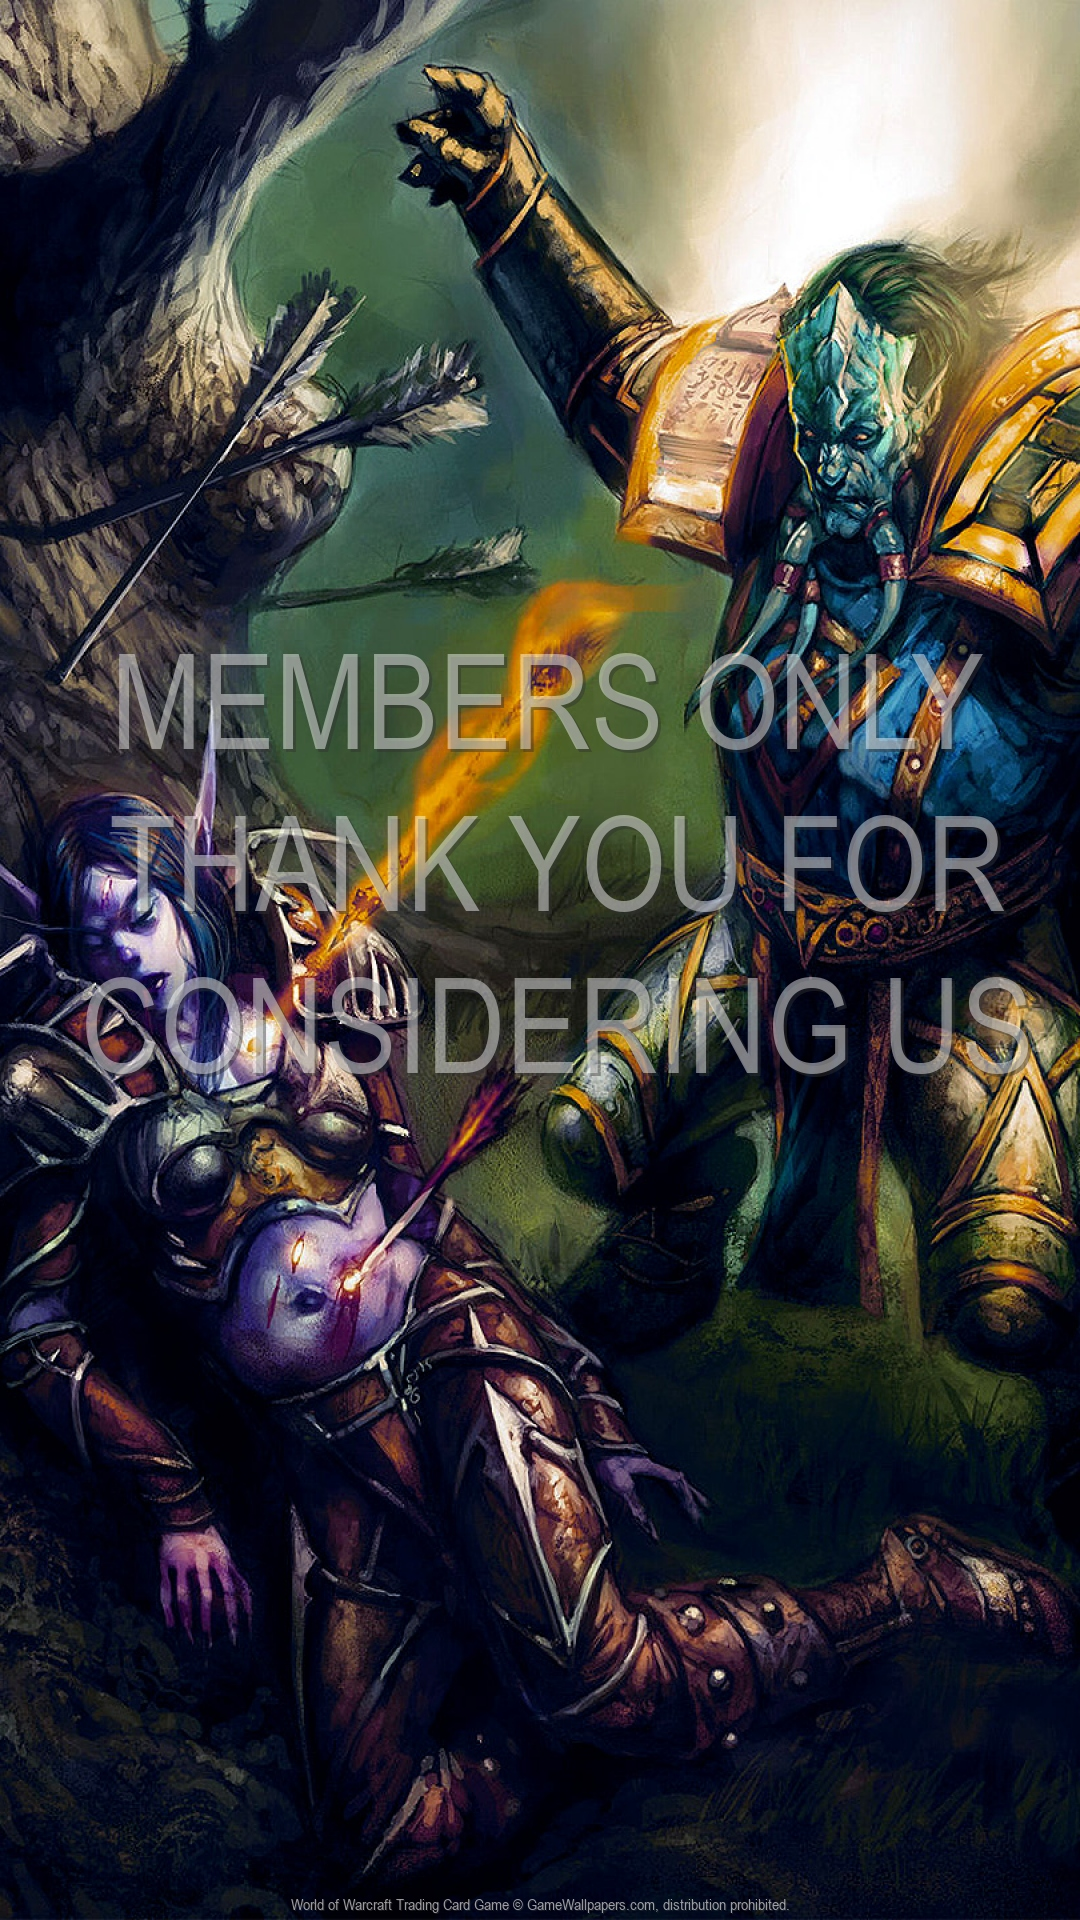 World of Warcraft: Trading Card Game 1920x1080 Handy Hintergrundbild 38